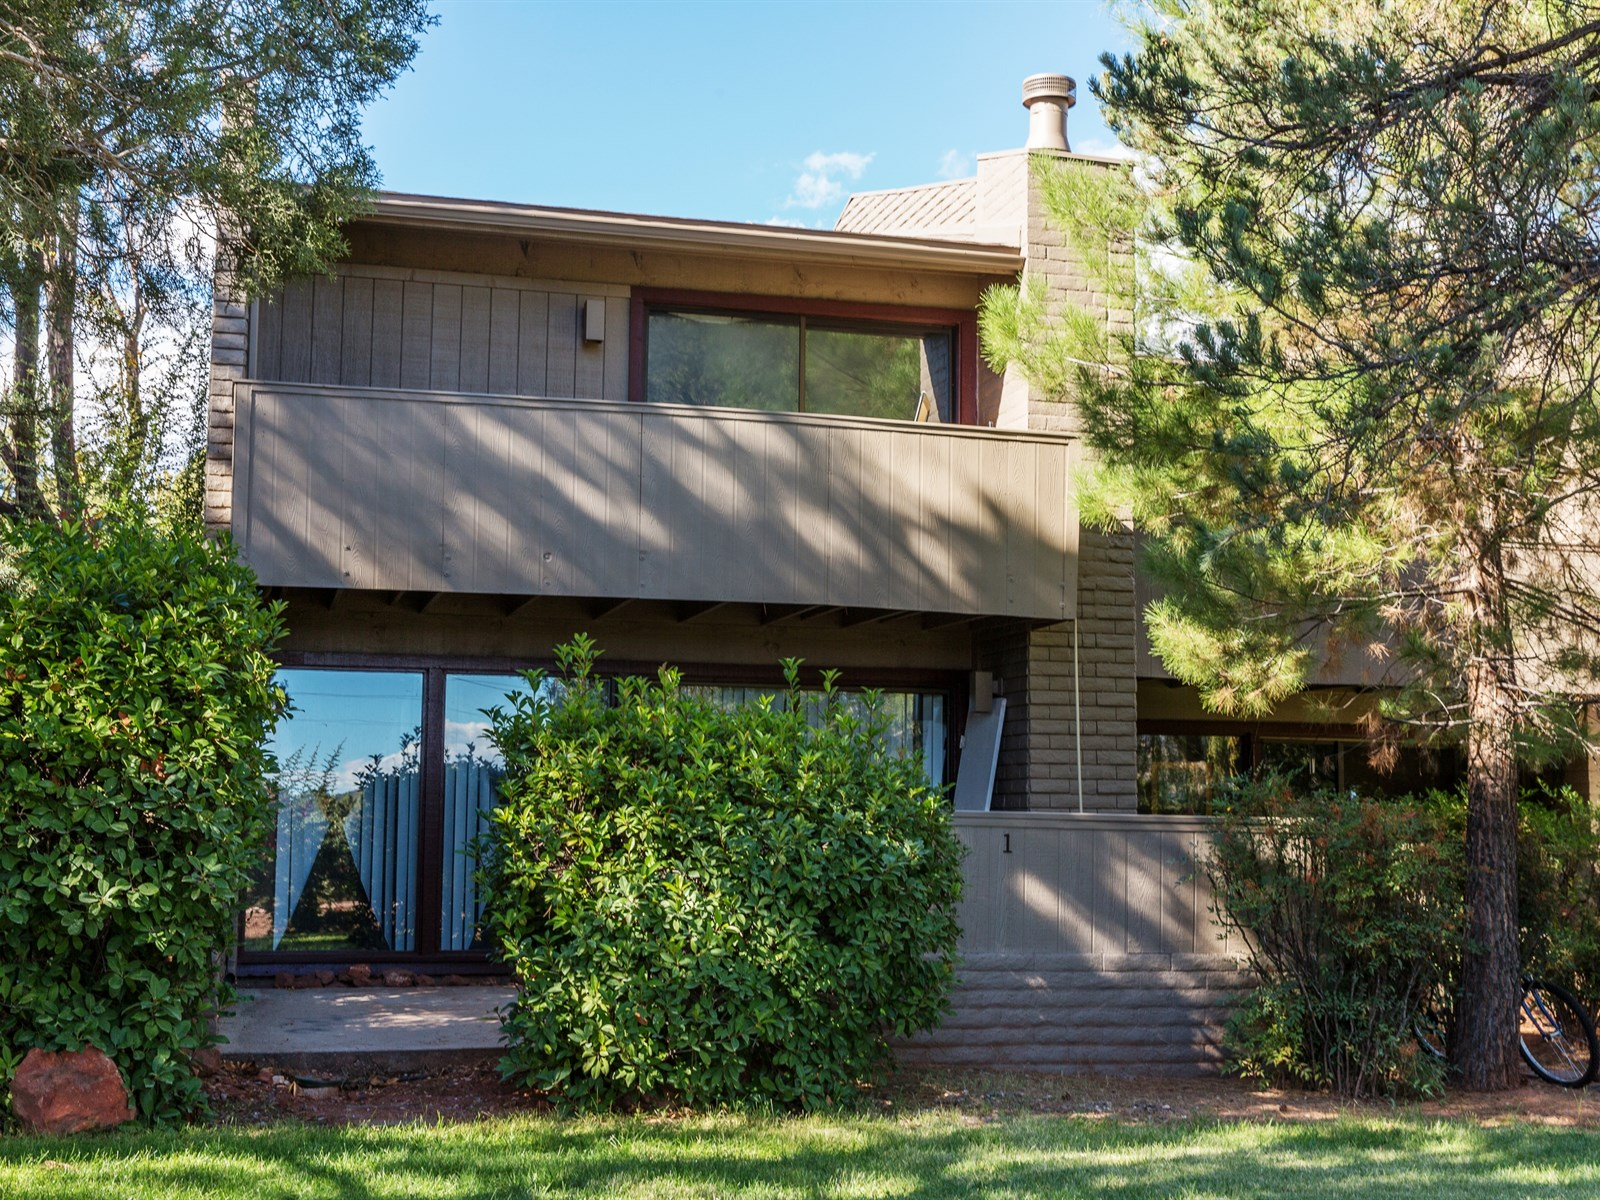 Nhà chung cư vì Bán tại Two Bed Two Bath Condo 3340 W State Route 89a Sedona, Arizona, 86336 Hoa Kỳ